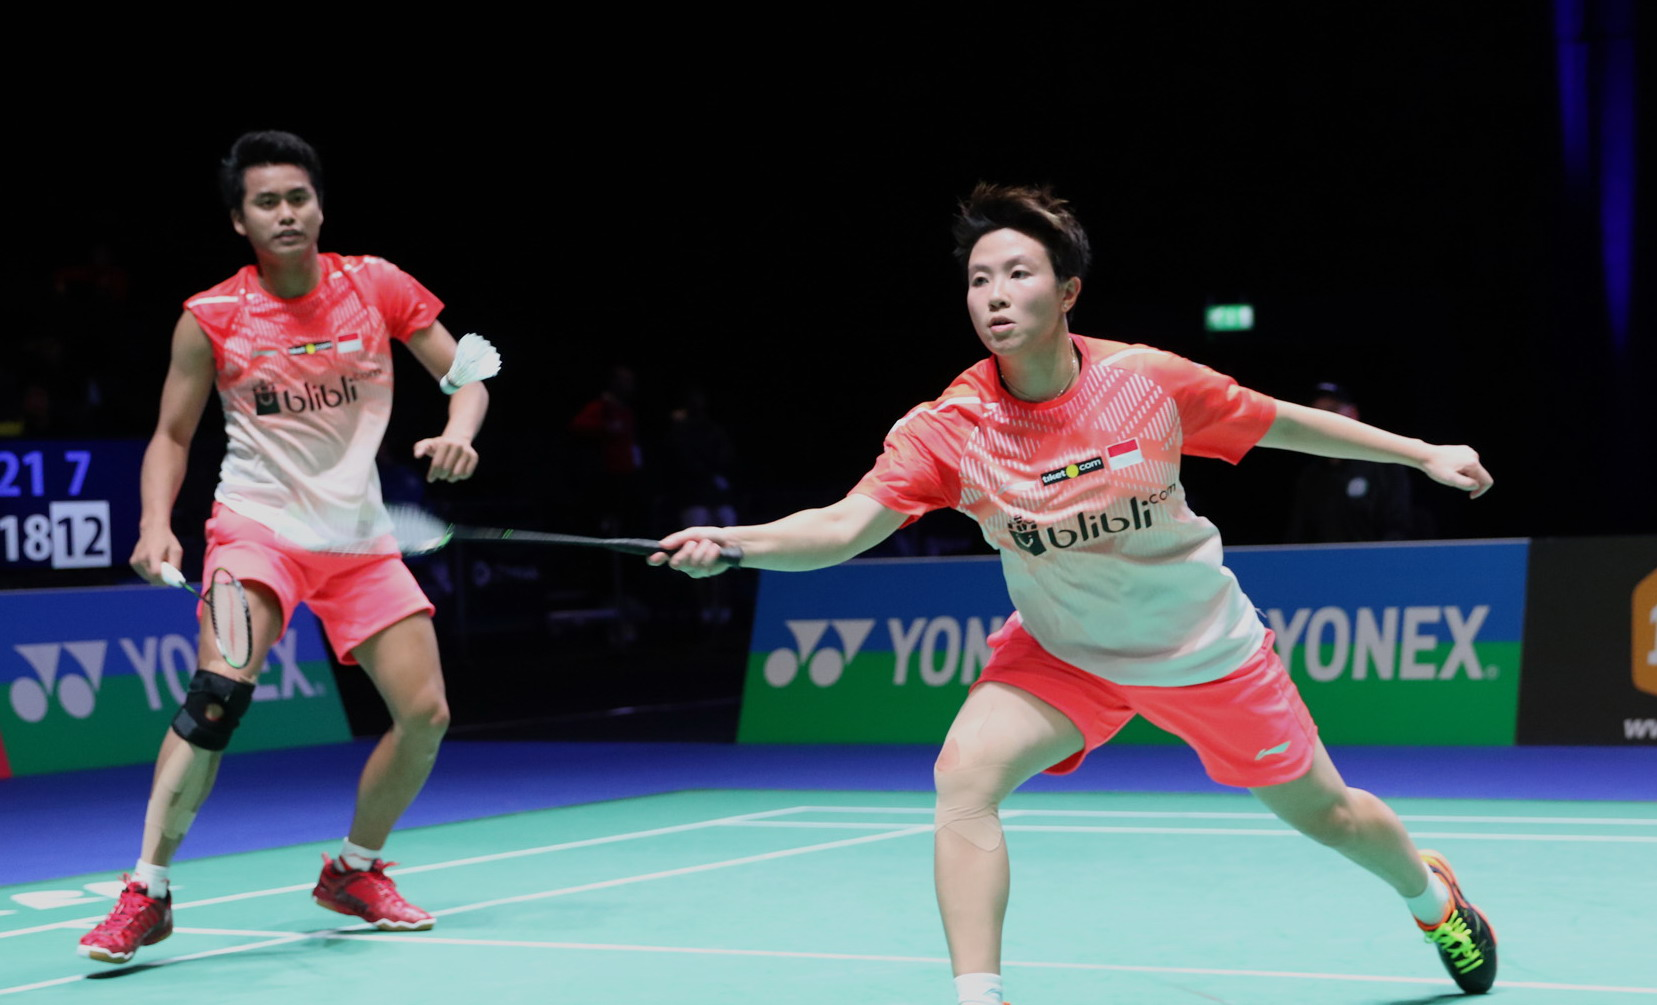 https: img-z.okeinfo.net content 2019 01 27 40 2010079 takluk-dari-wakil-china-tontowi-liliyana-gagal-juarai-indonesia-masters-2019-Tqh8rhtLaN.jpg